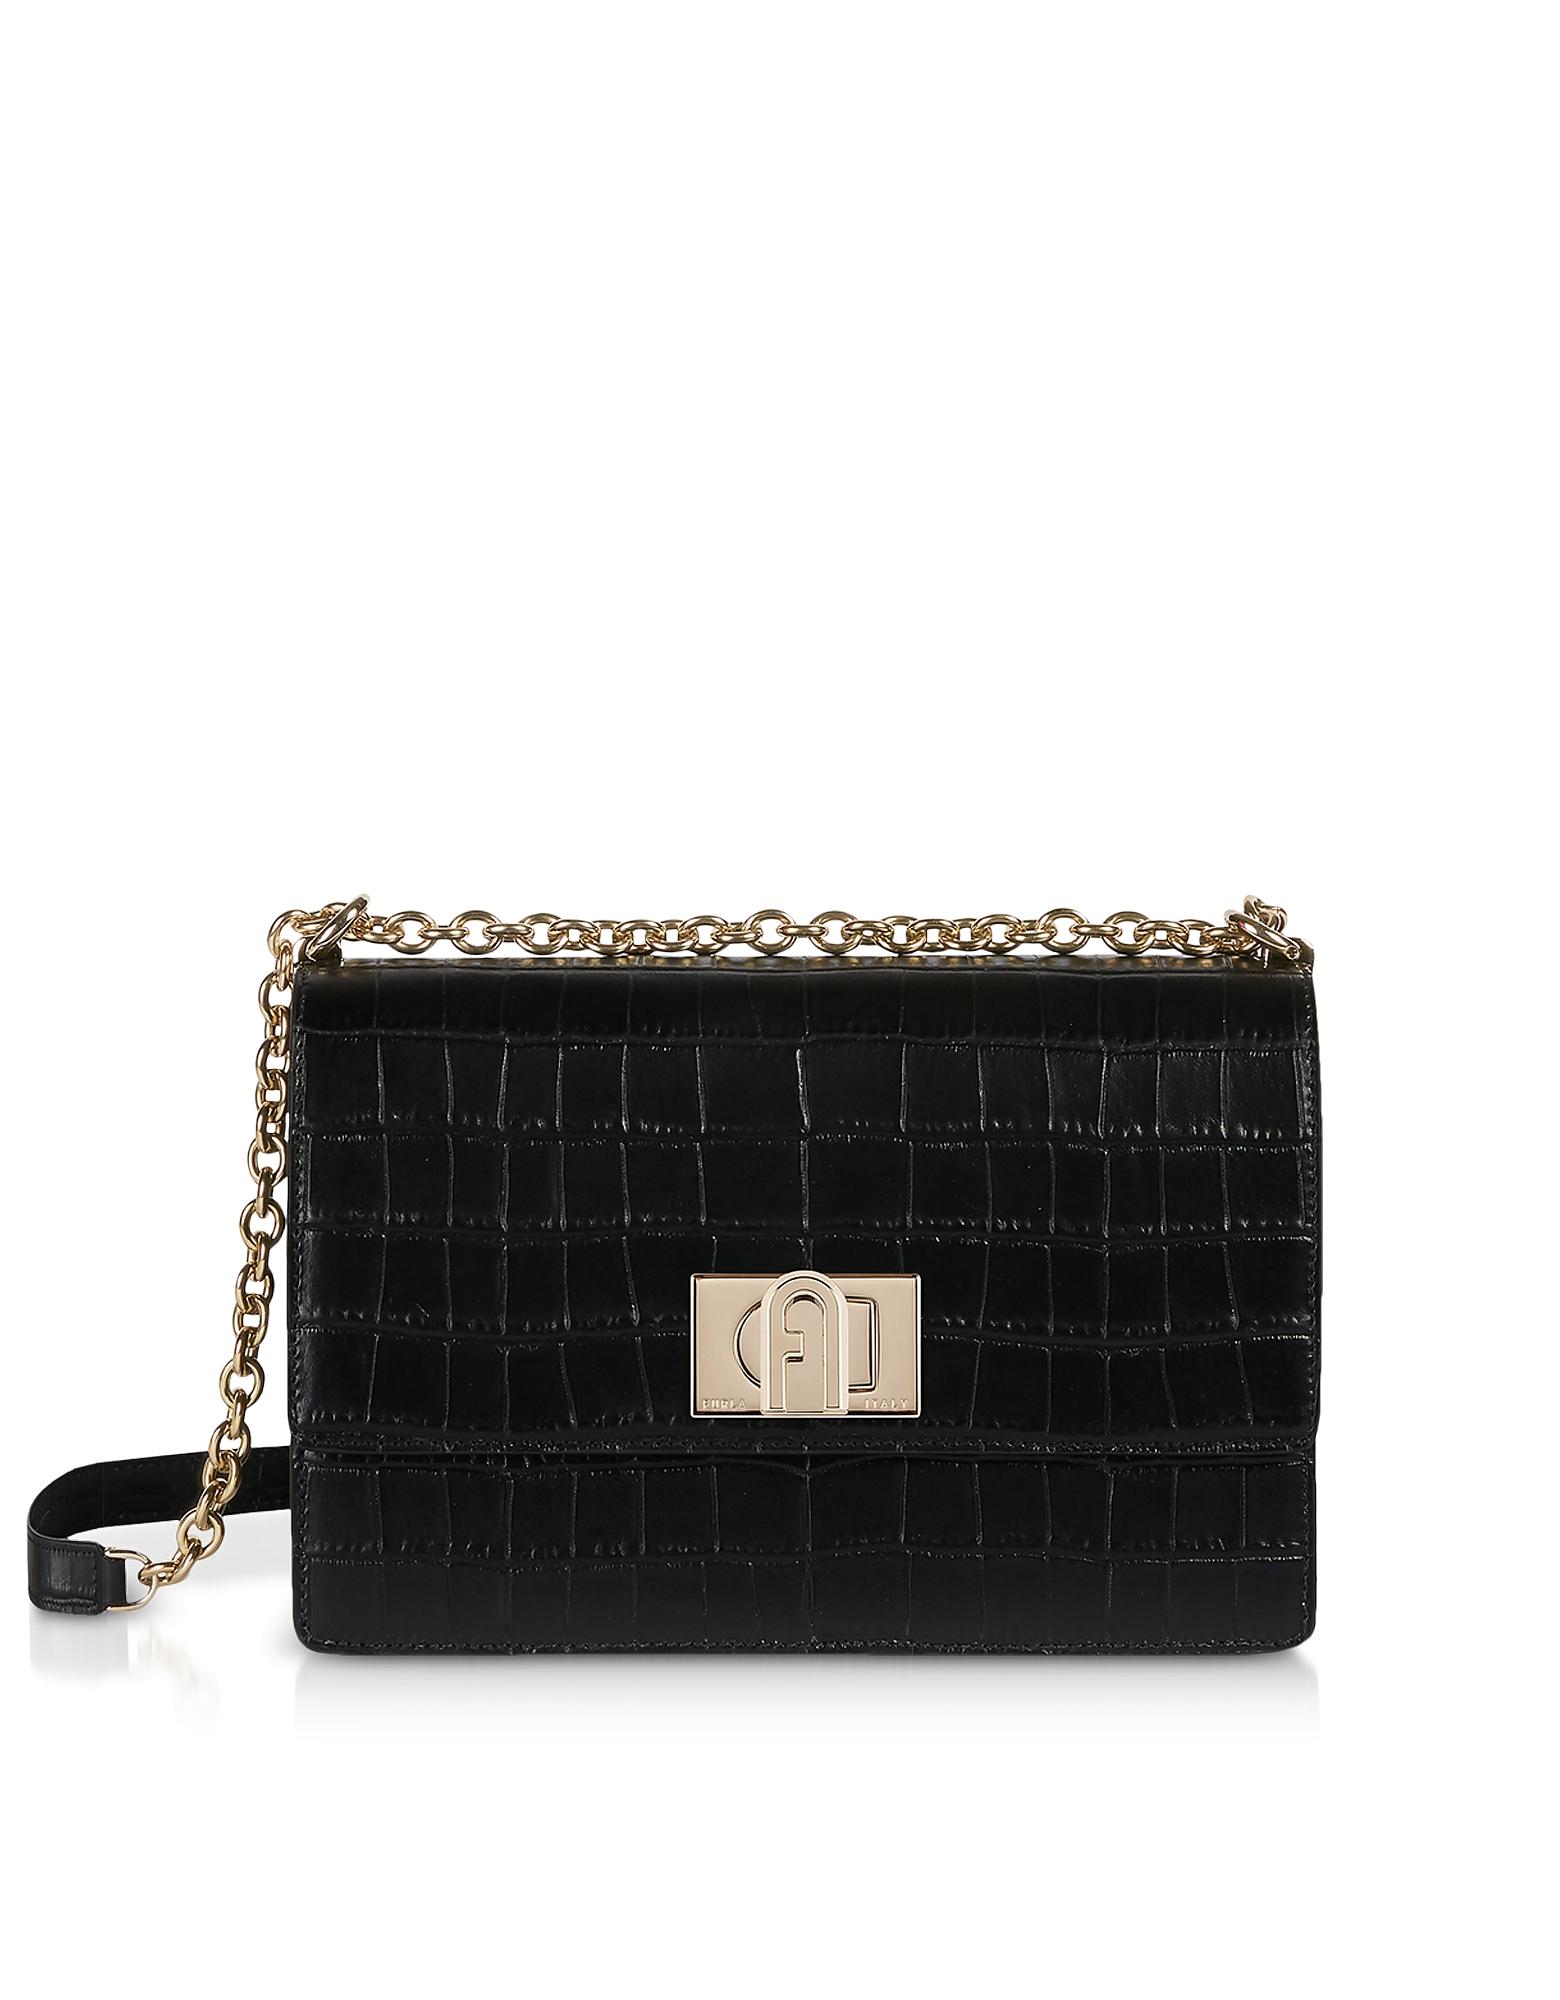 Furla Designer Handbags, Croco Embossed Leather 1927 S Crossbody Bag 24